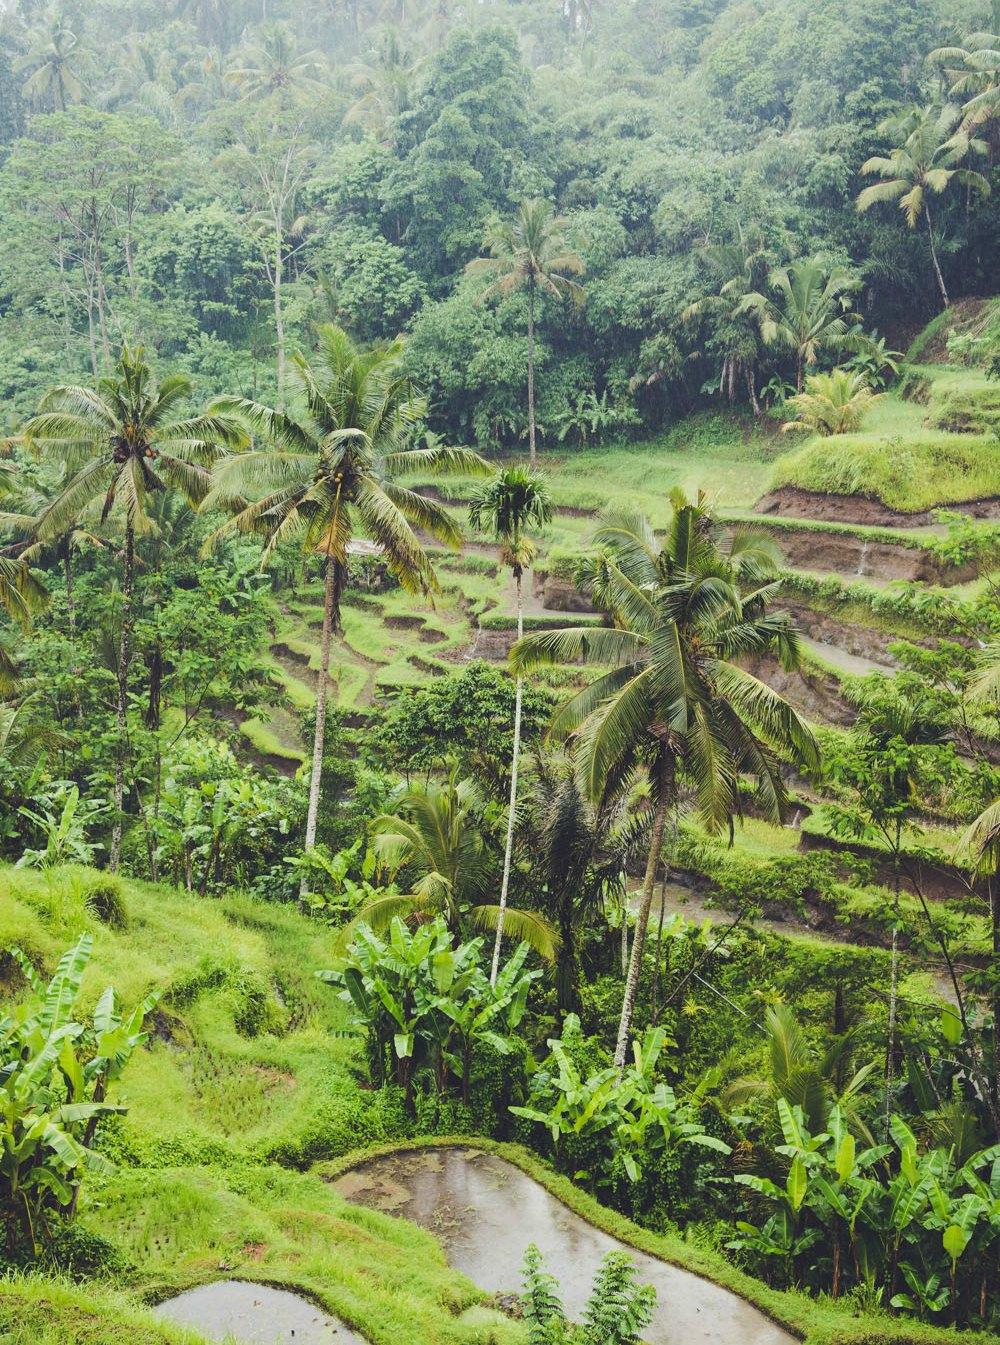 bali travel guide 2